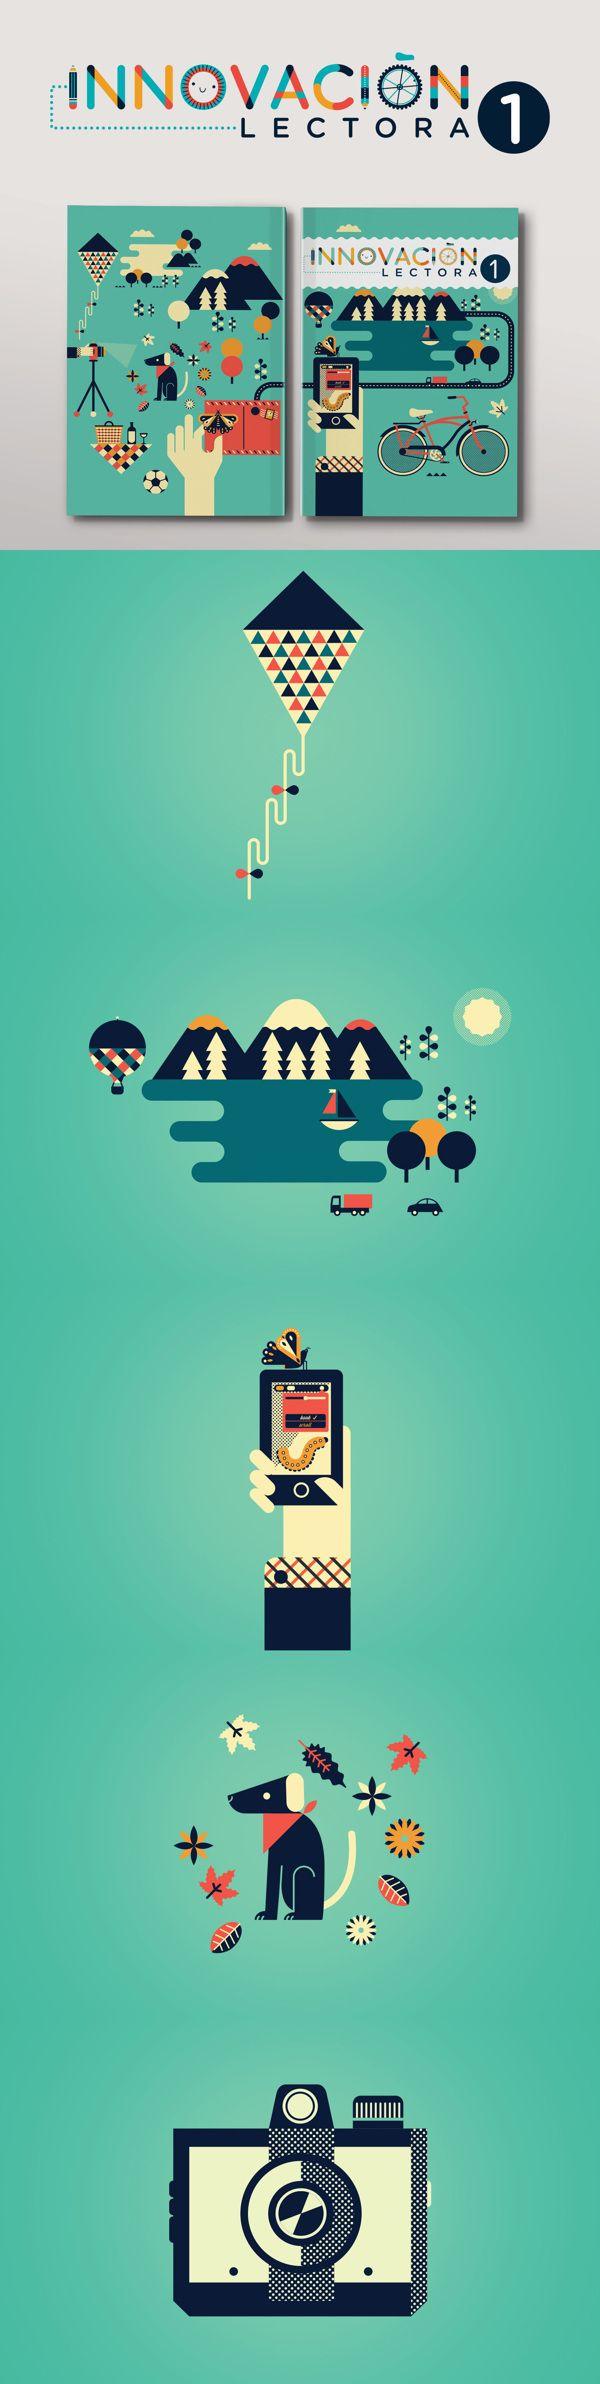 Innovación Lectora S...@me!i!i!i!采集到矢量/3d/像素(2636图)_花瓣插画/漫画